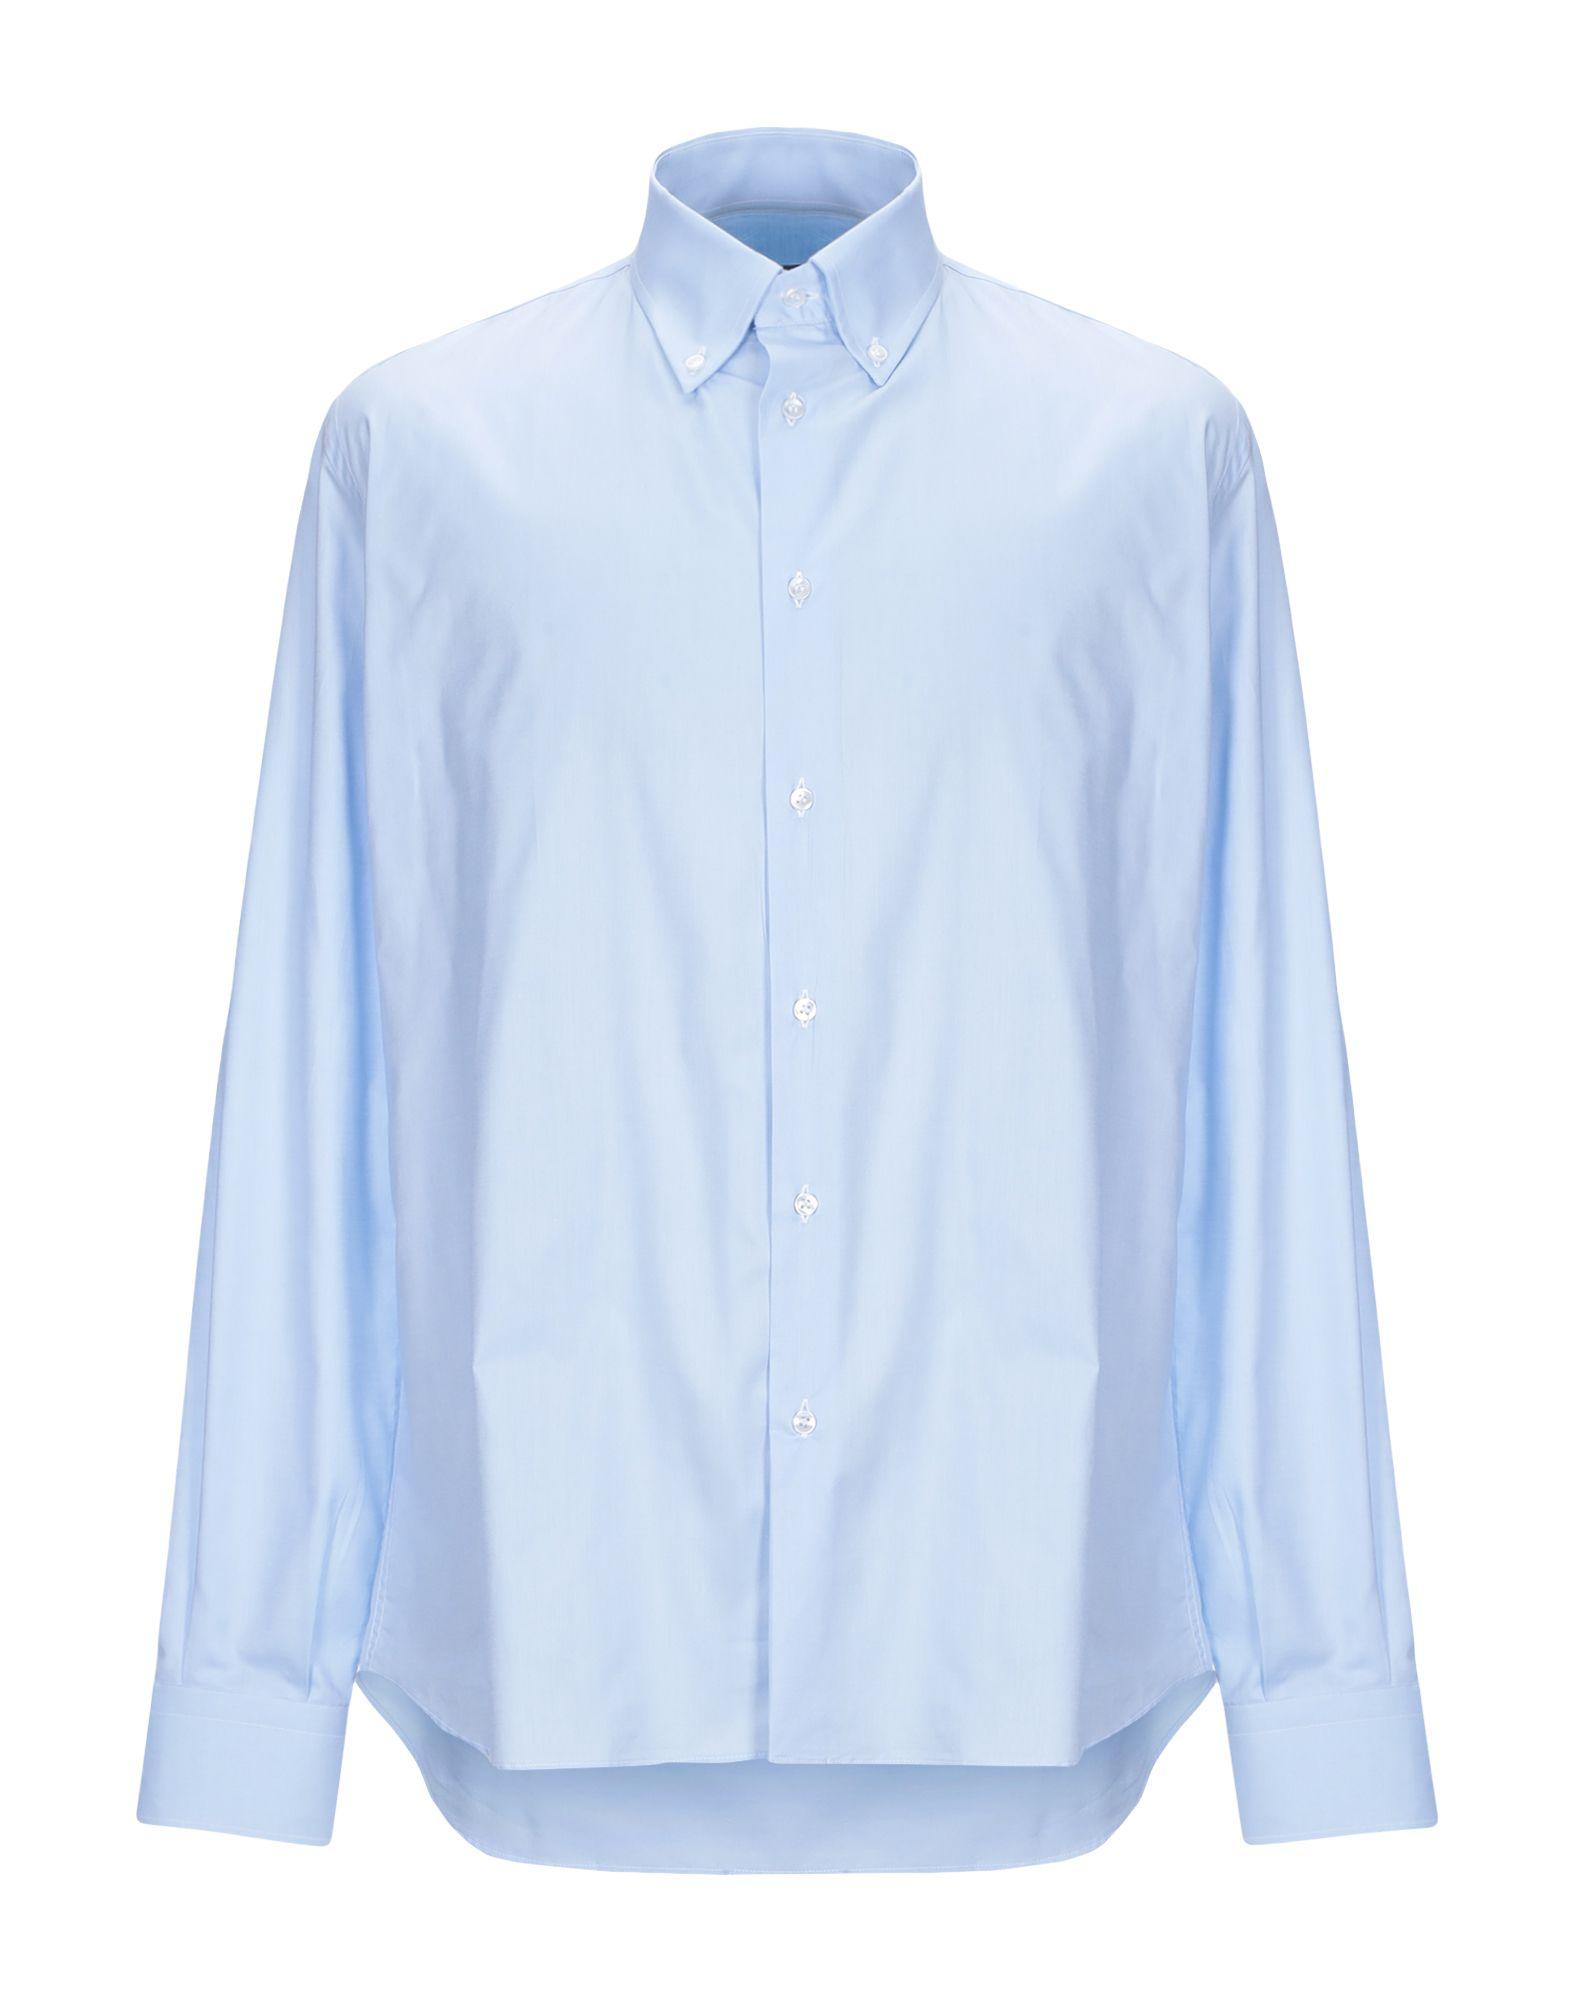 J.W. SAX Milano Pубашка white 5 milano pубашка